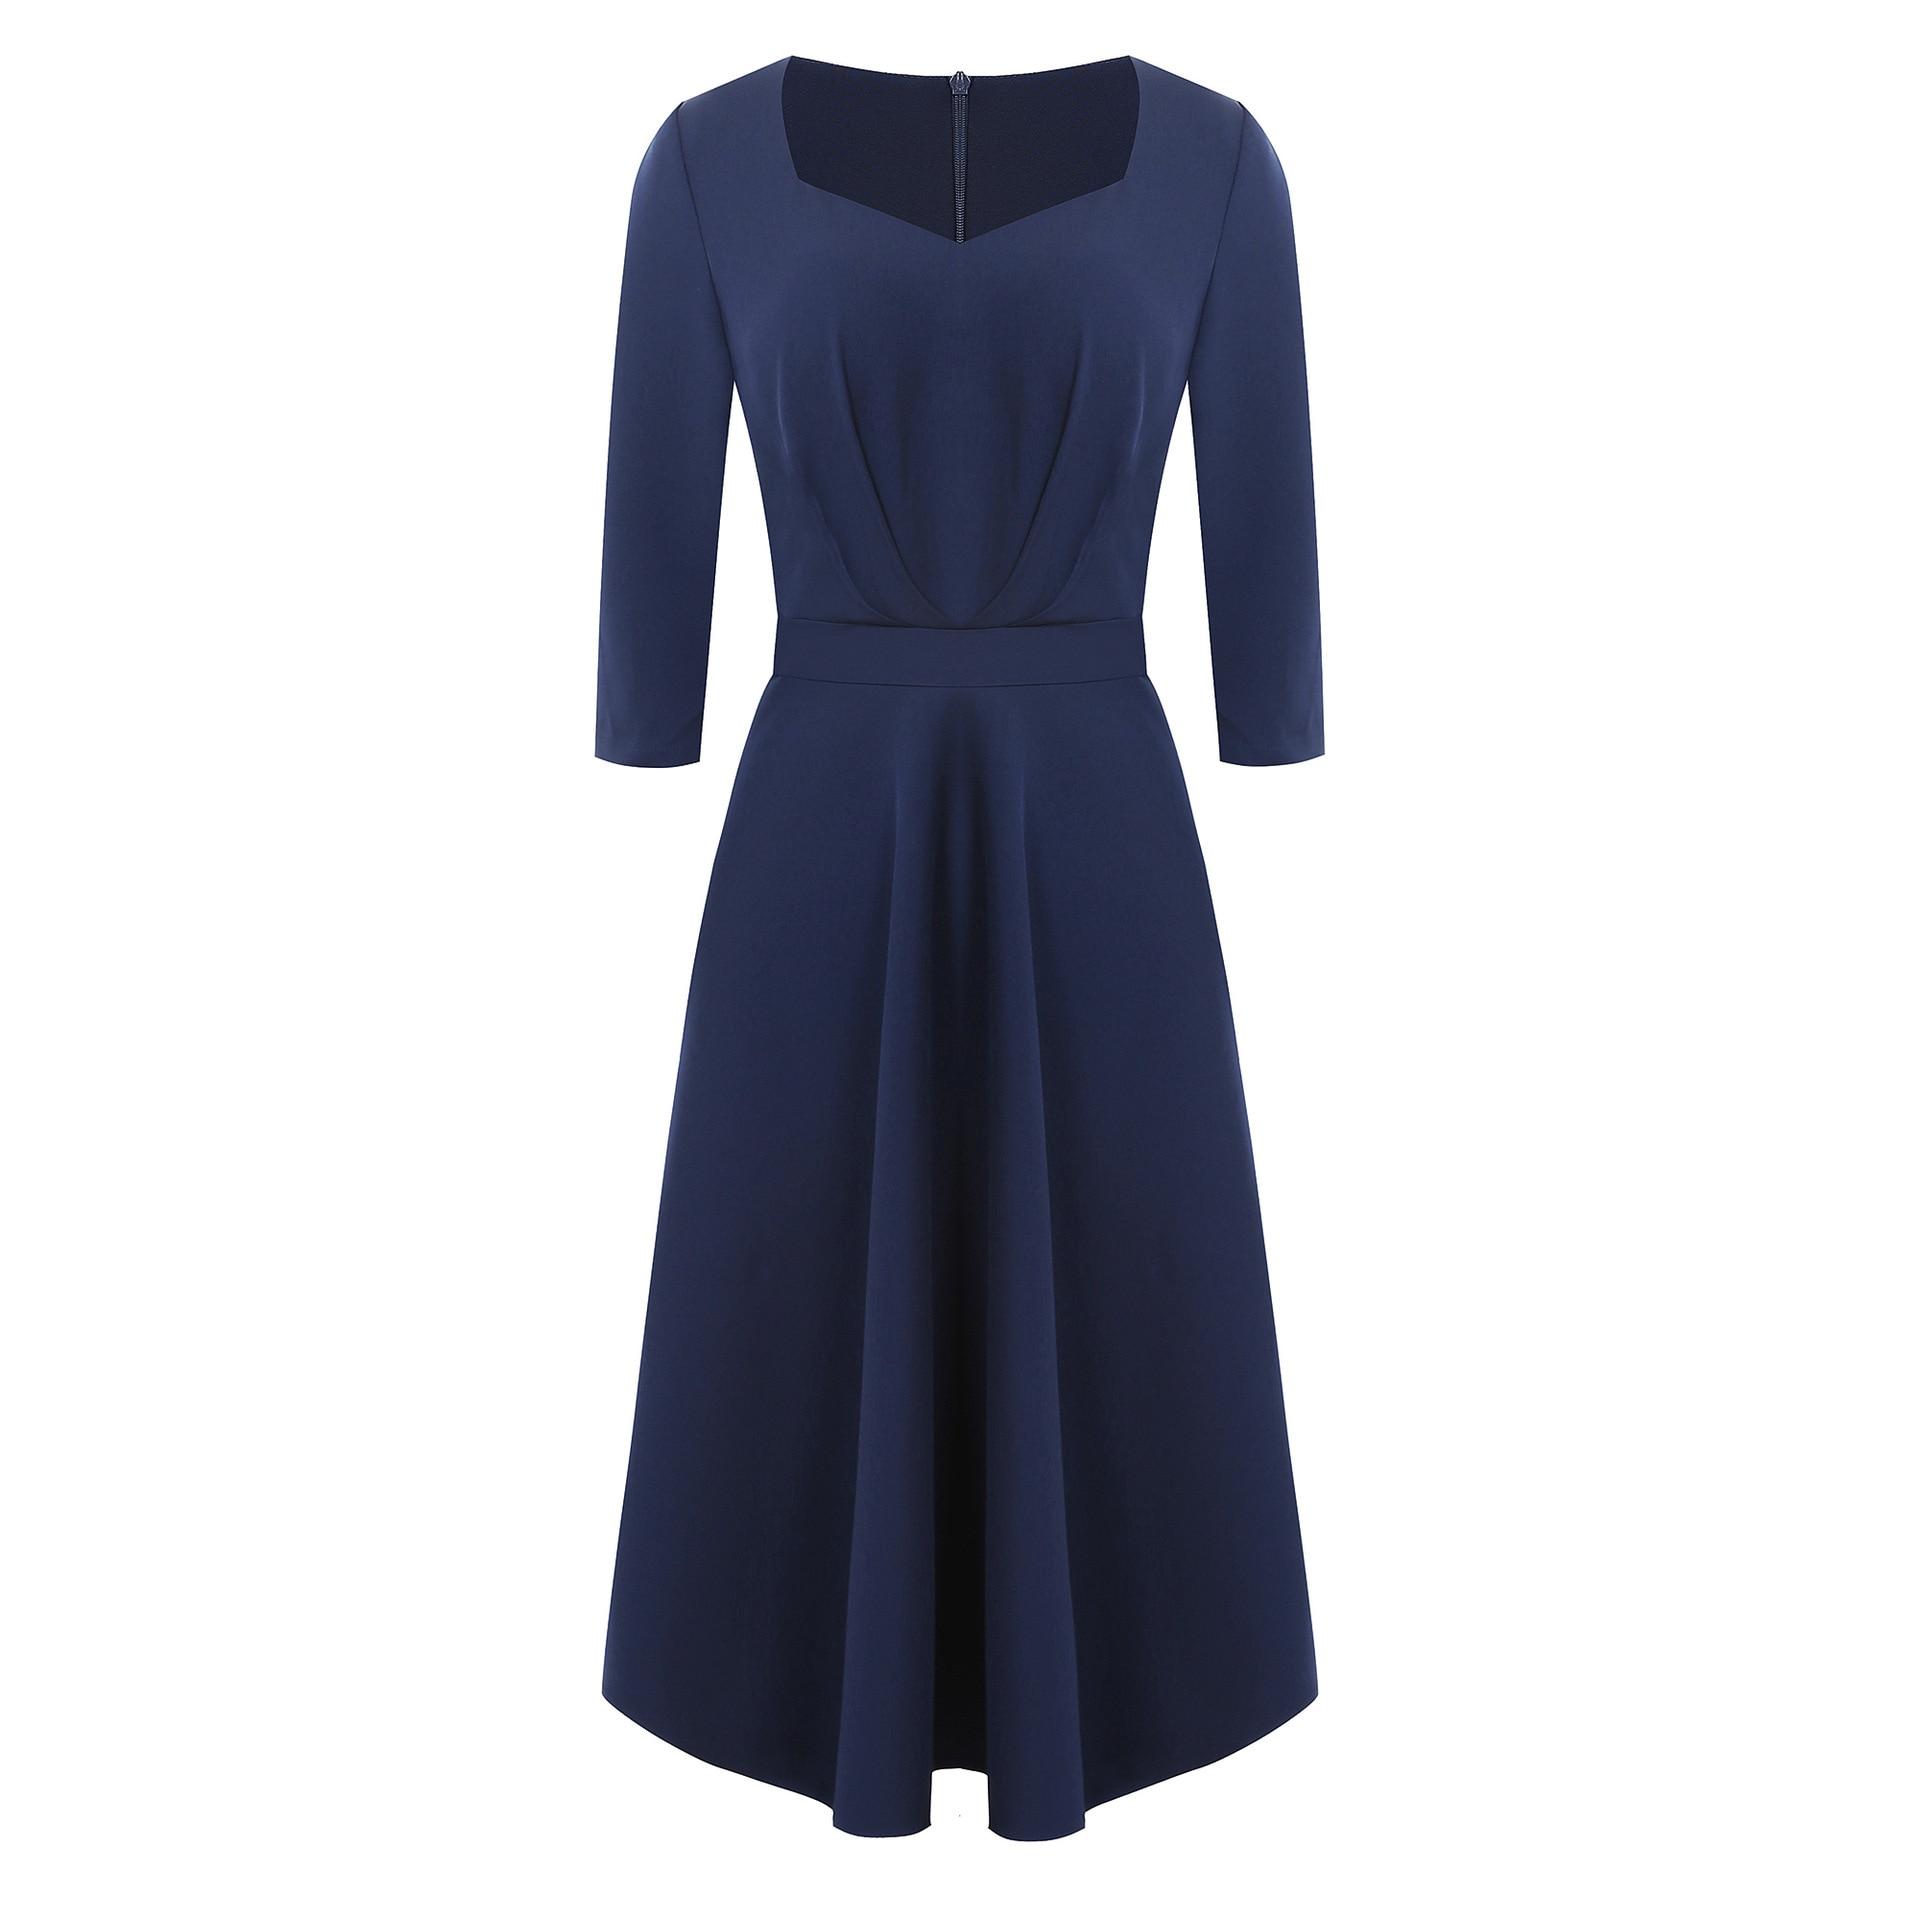 WOMEN'S Dress Autumn And Winter New Style Hepburn Wind Retro Cocktail Will Formal High Waist Dress